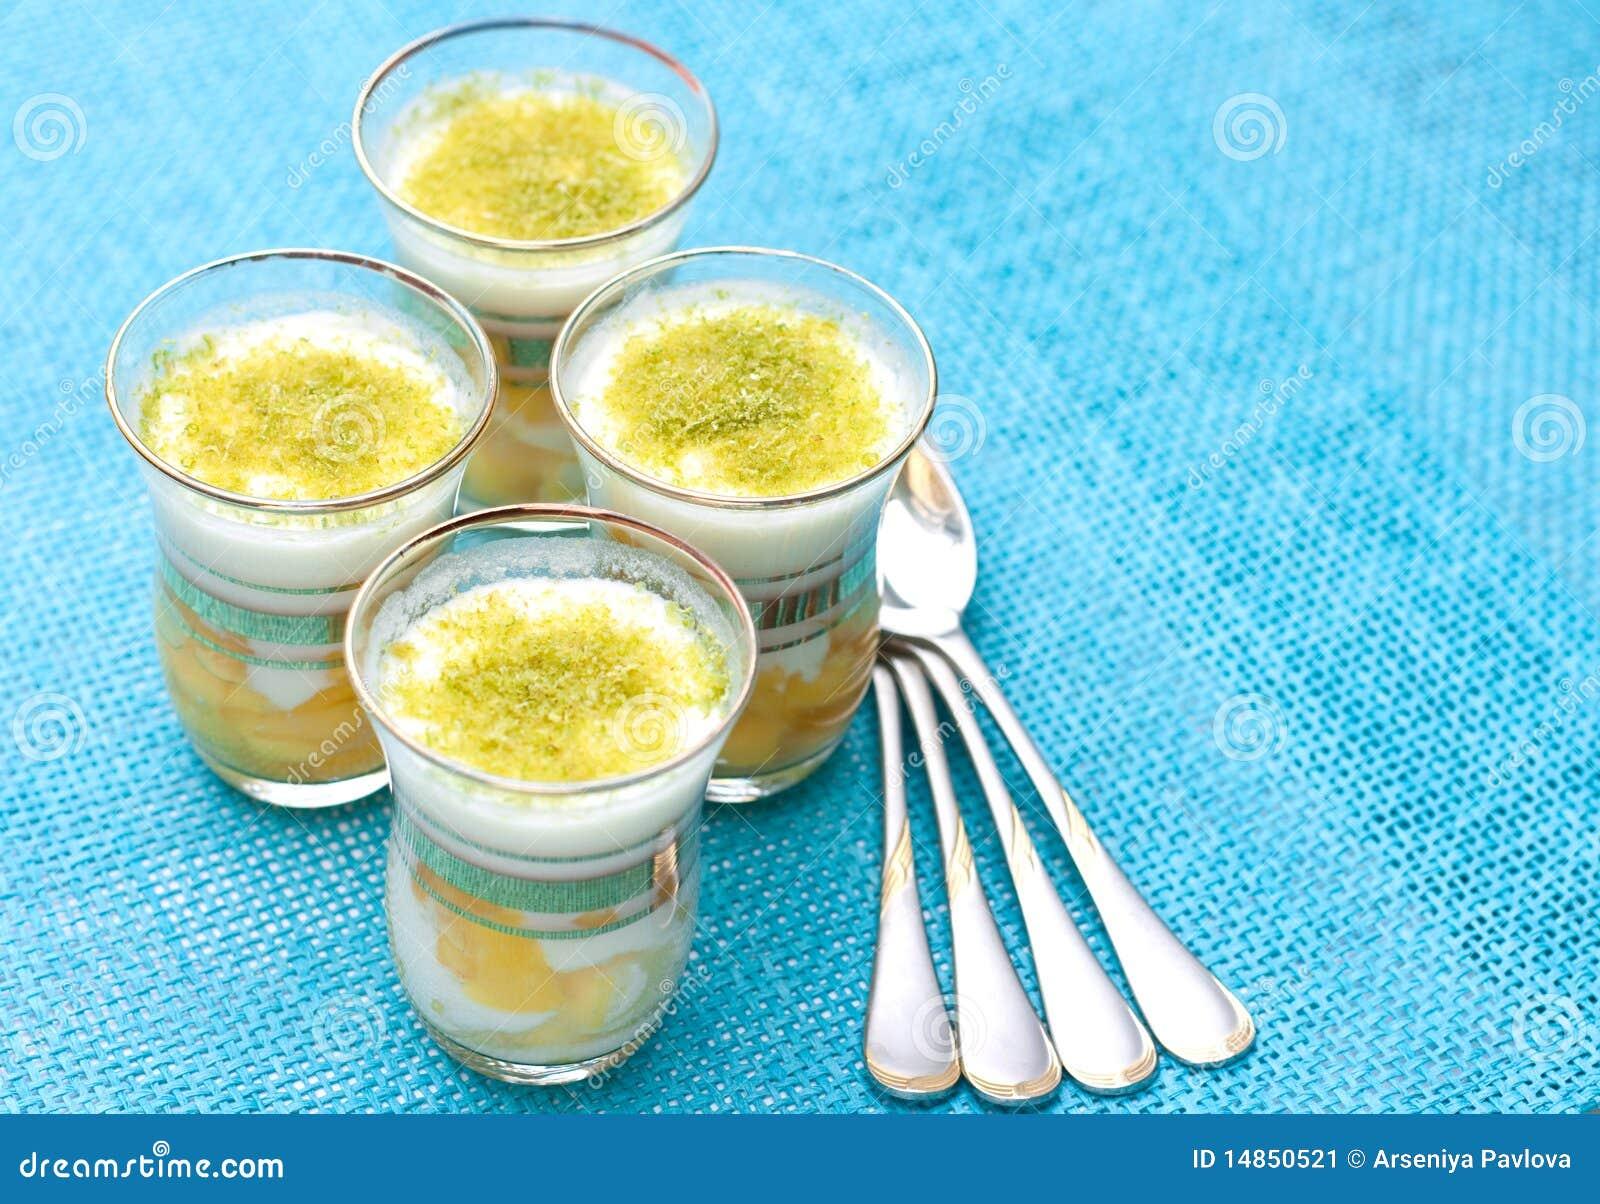 Dessert with mango